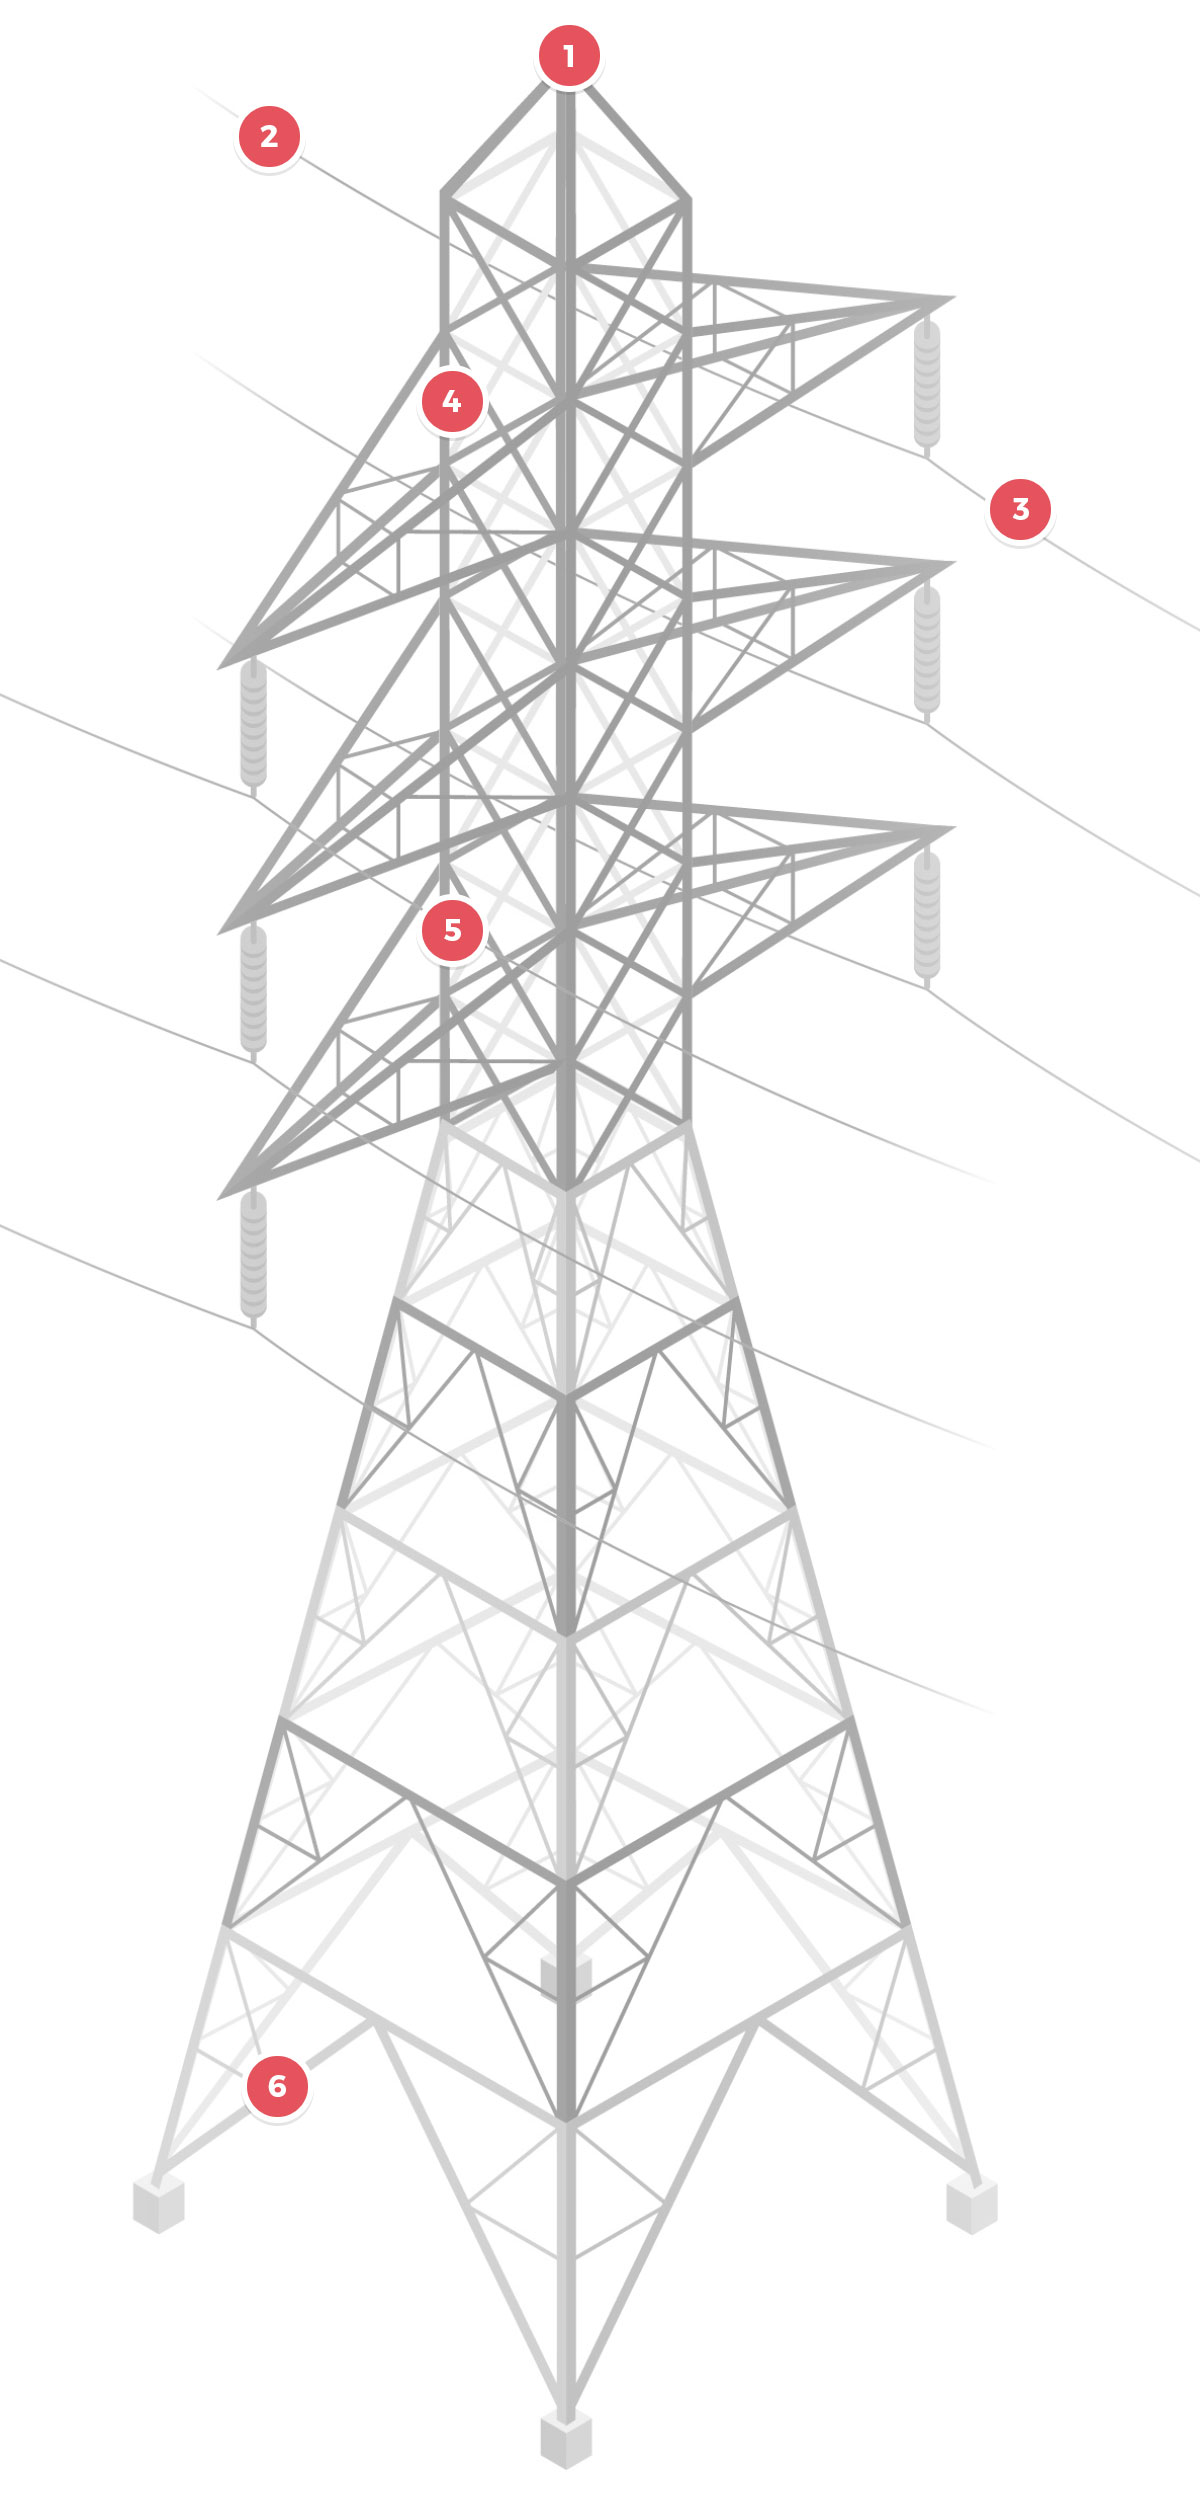 delta-box_aplicaciones_balizaje-linea-alta-tension-schema-visuel